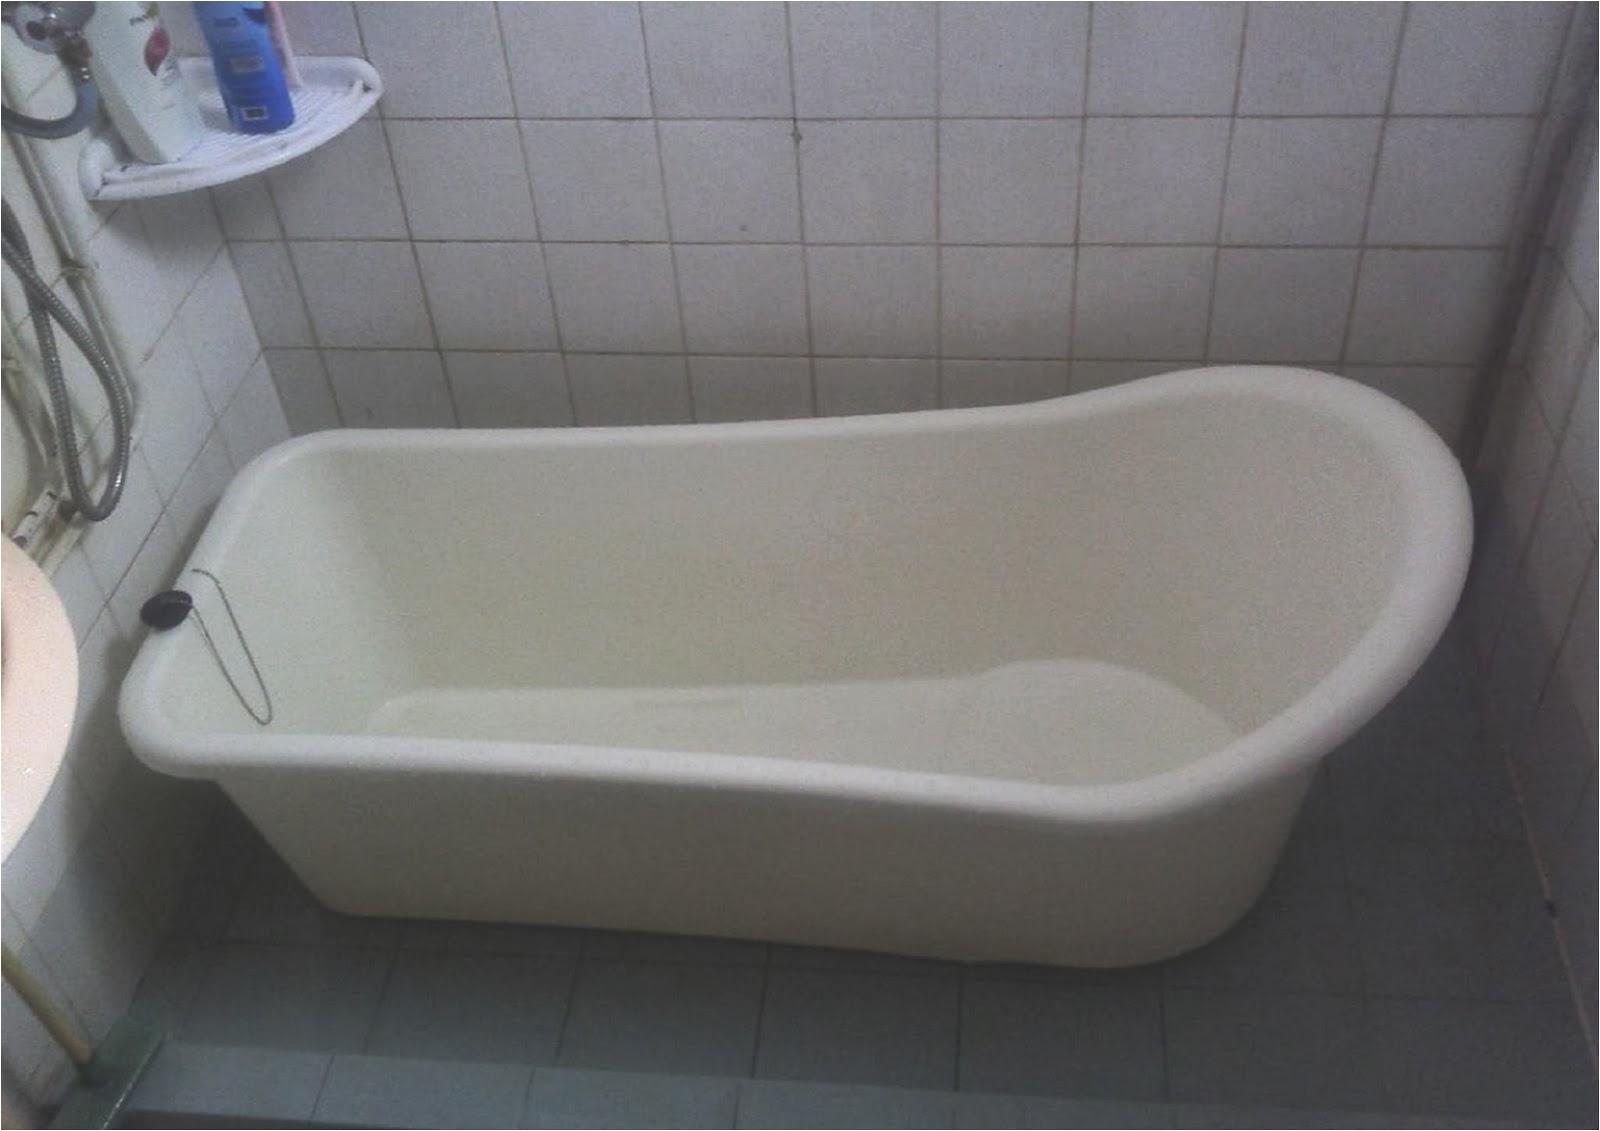 Portable Bathtub Sg Affordable Bathtub for Singapore Hdb Flat and Other Homes